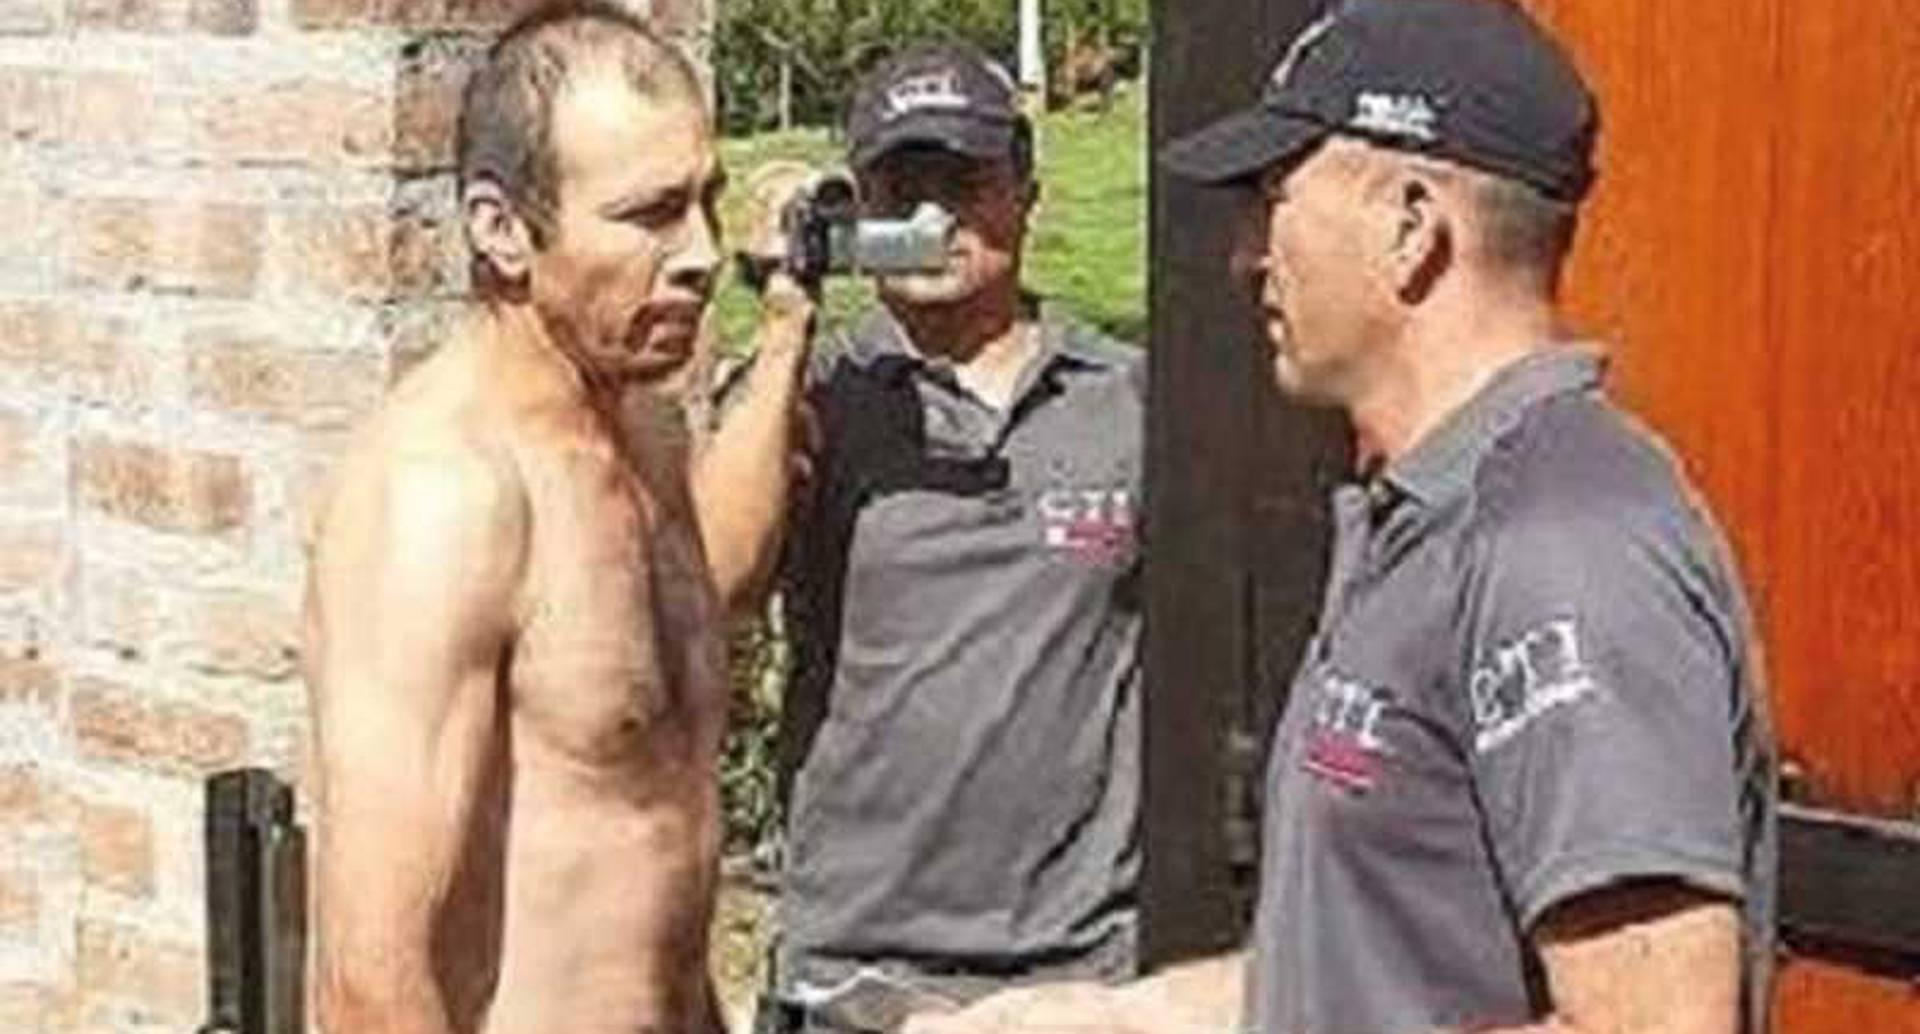 El asesino de Guarne: Jaime Iván Martínez Betancur. 4 asesinatos confirmados, 20 por aclarar.